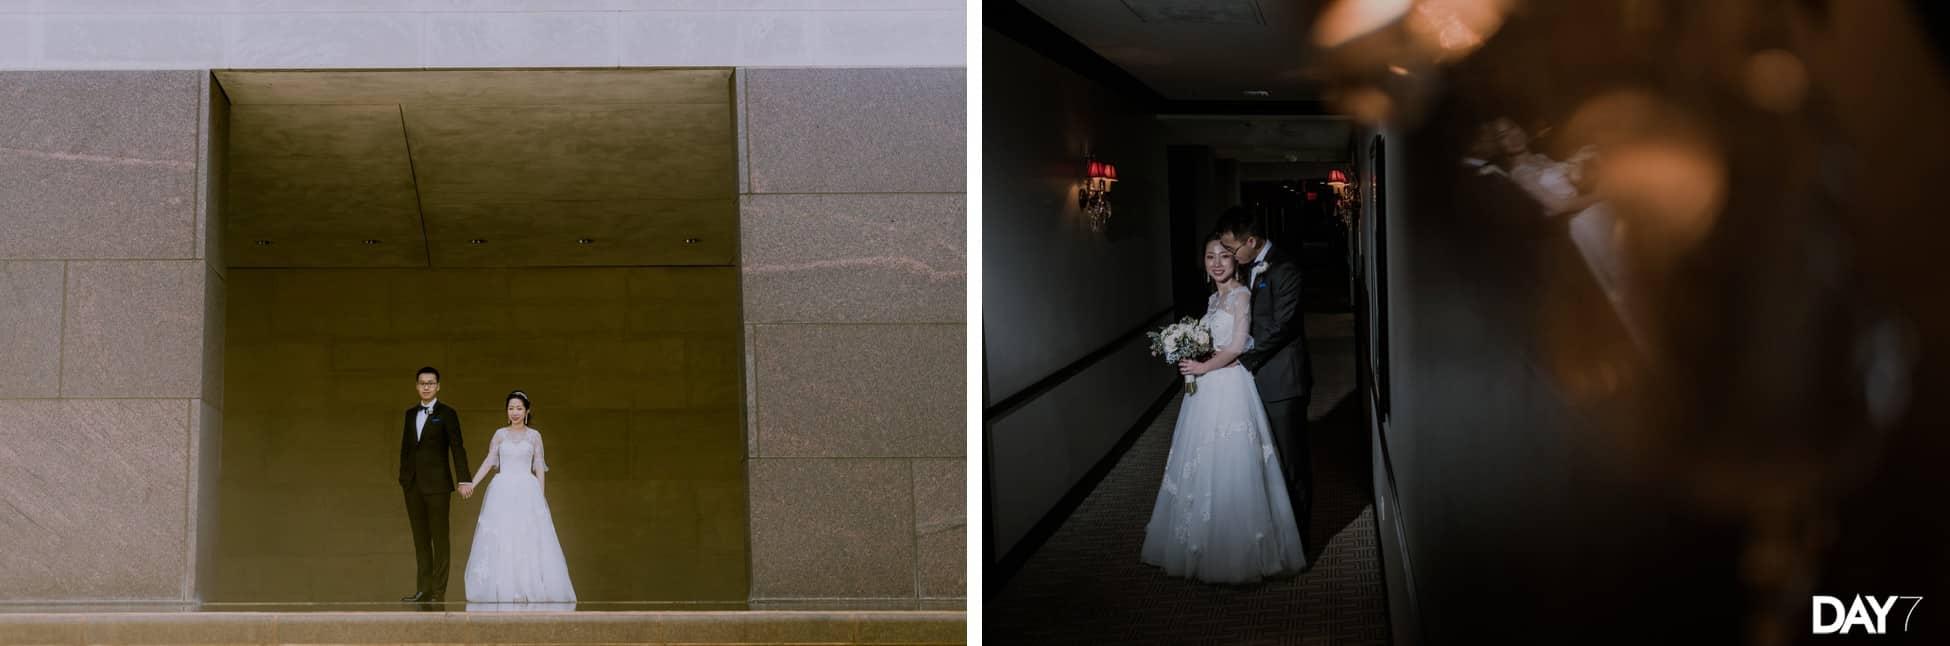 Hotel Zaza Wedding Photography_0027